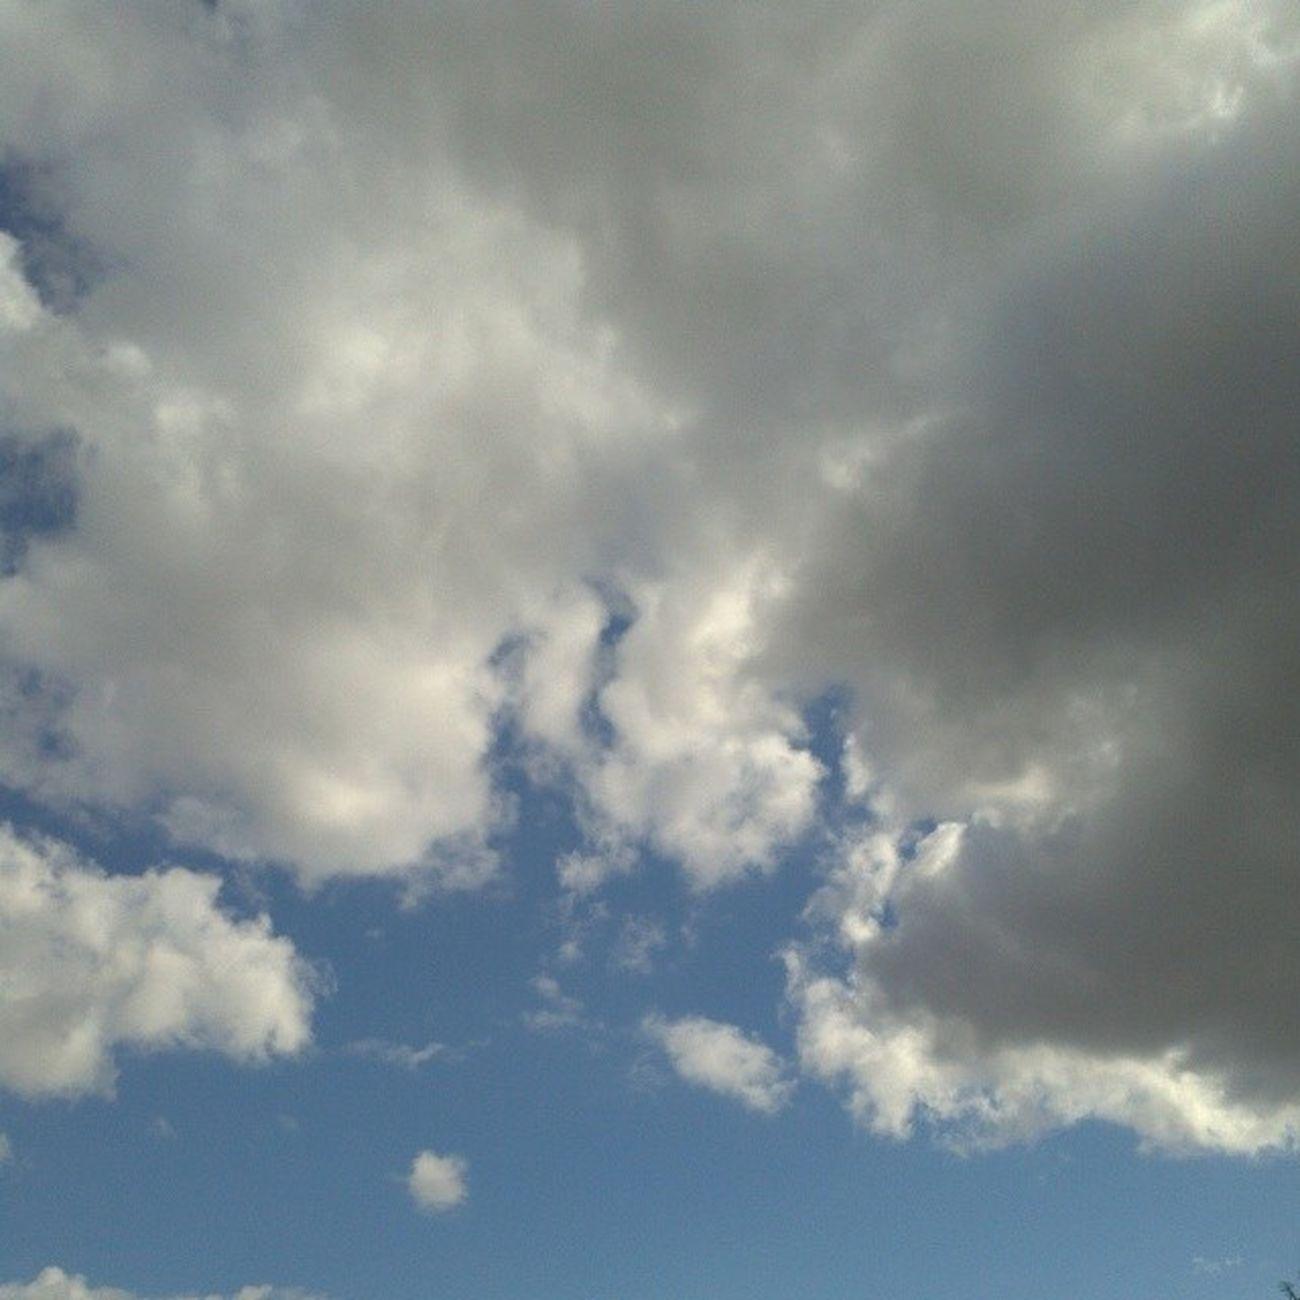 Head in the .... PaintJob Clouds Life 2013 fall swag smoke 420 instagram instalike instagood youtuber l4l liking like spam like4like likeforlike followforfollow followme okill3rjesuso